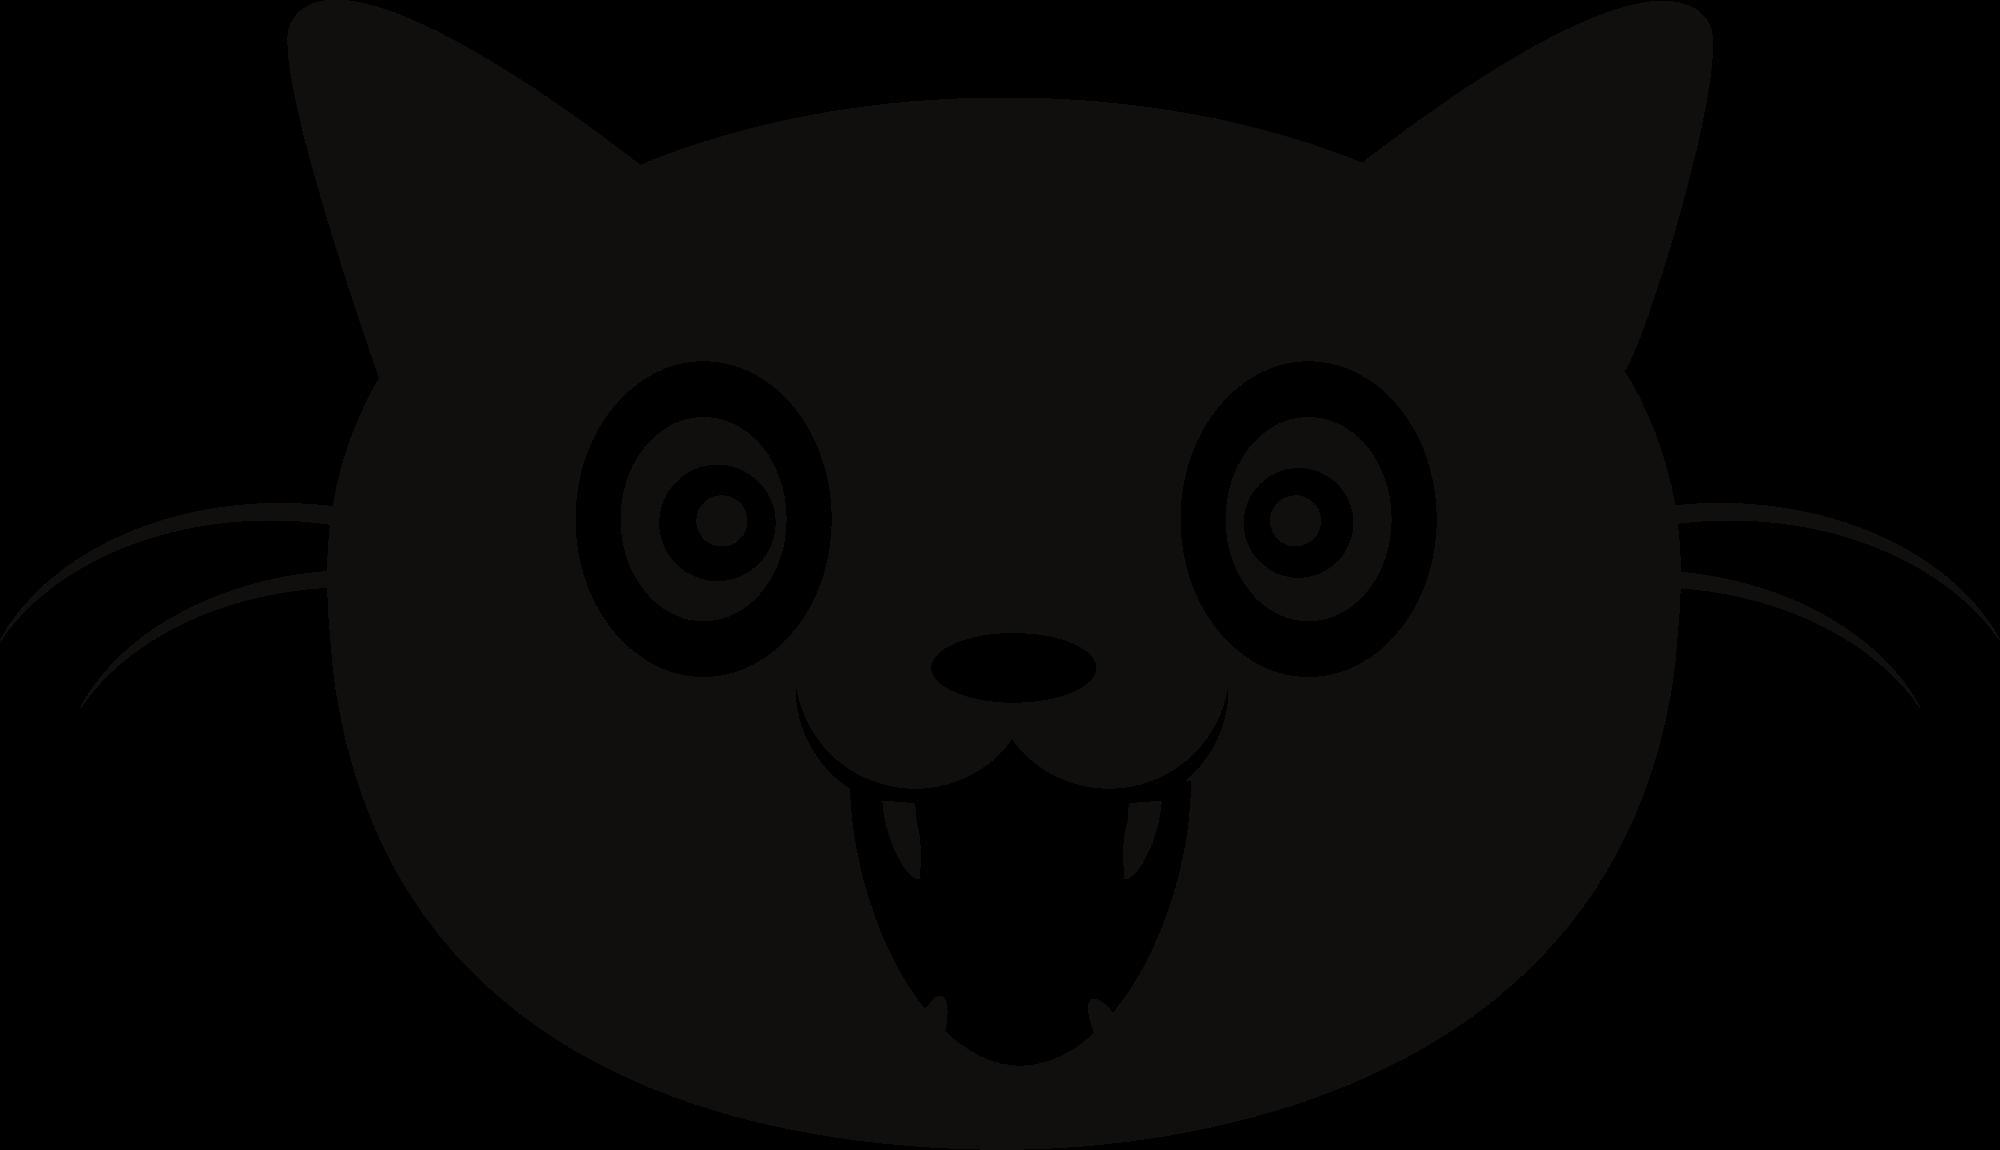 Cat face clipart transparent image royalty free library File:Internet Defense League logo - cat face.svg - Wikimedia Commons image royalty free library